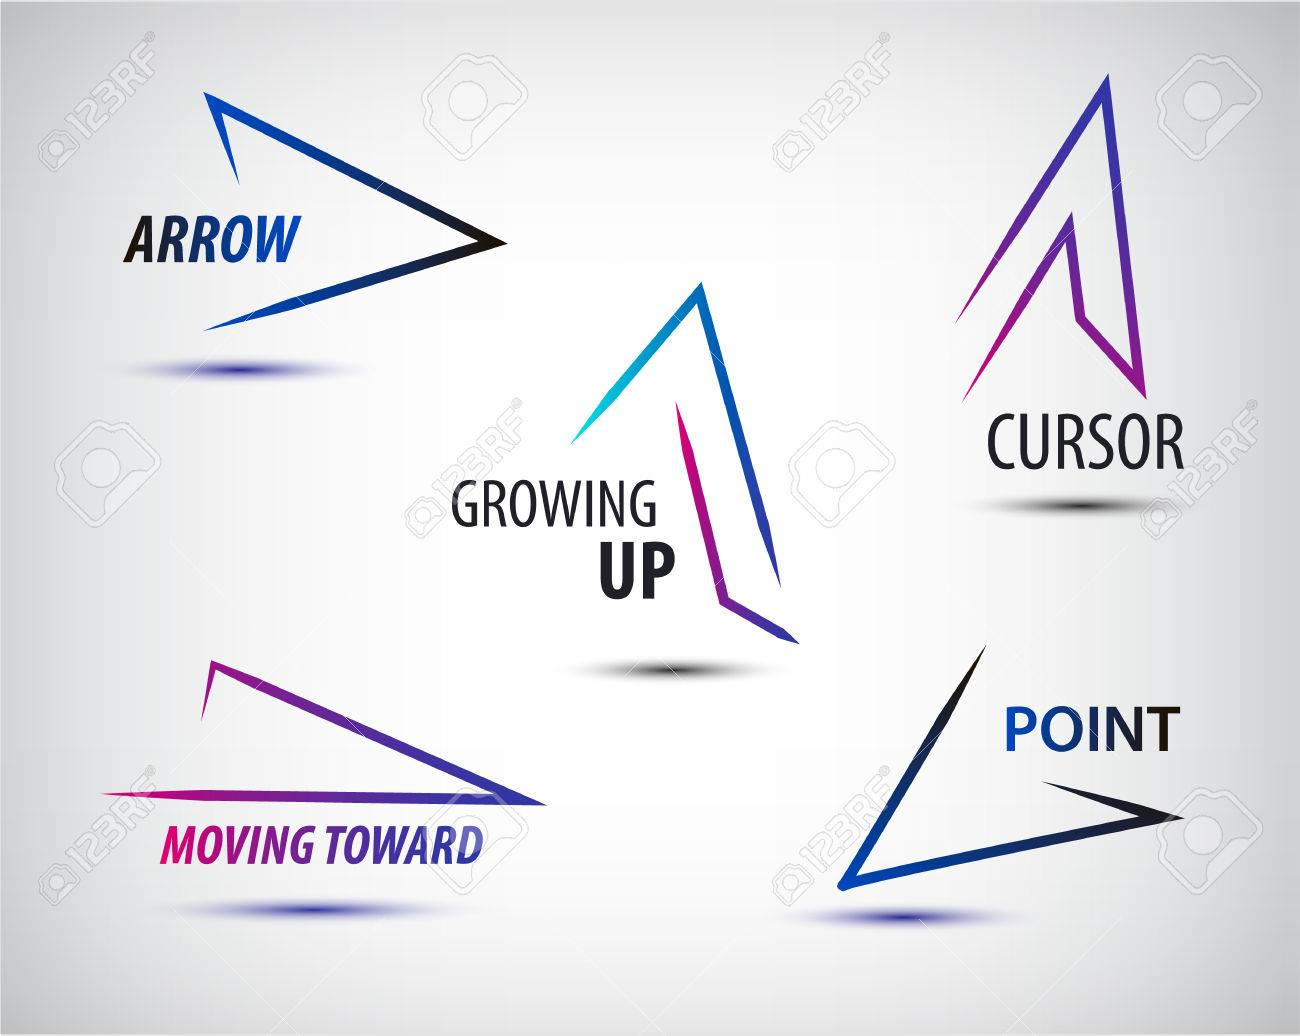 Vector set of line colorful arrows templates, arrow logo design, web logo, icon, abstract, geometric logo - 52756631